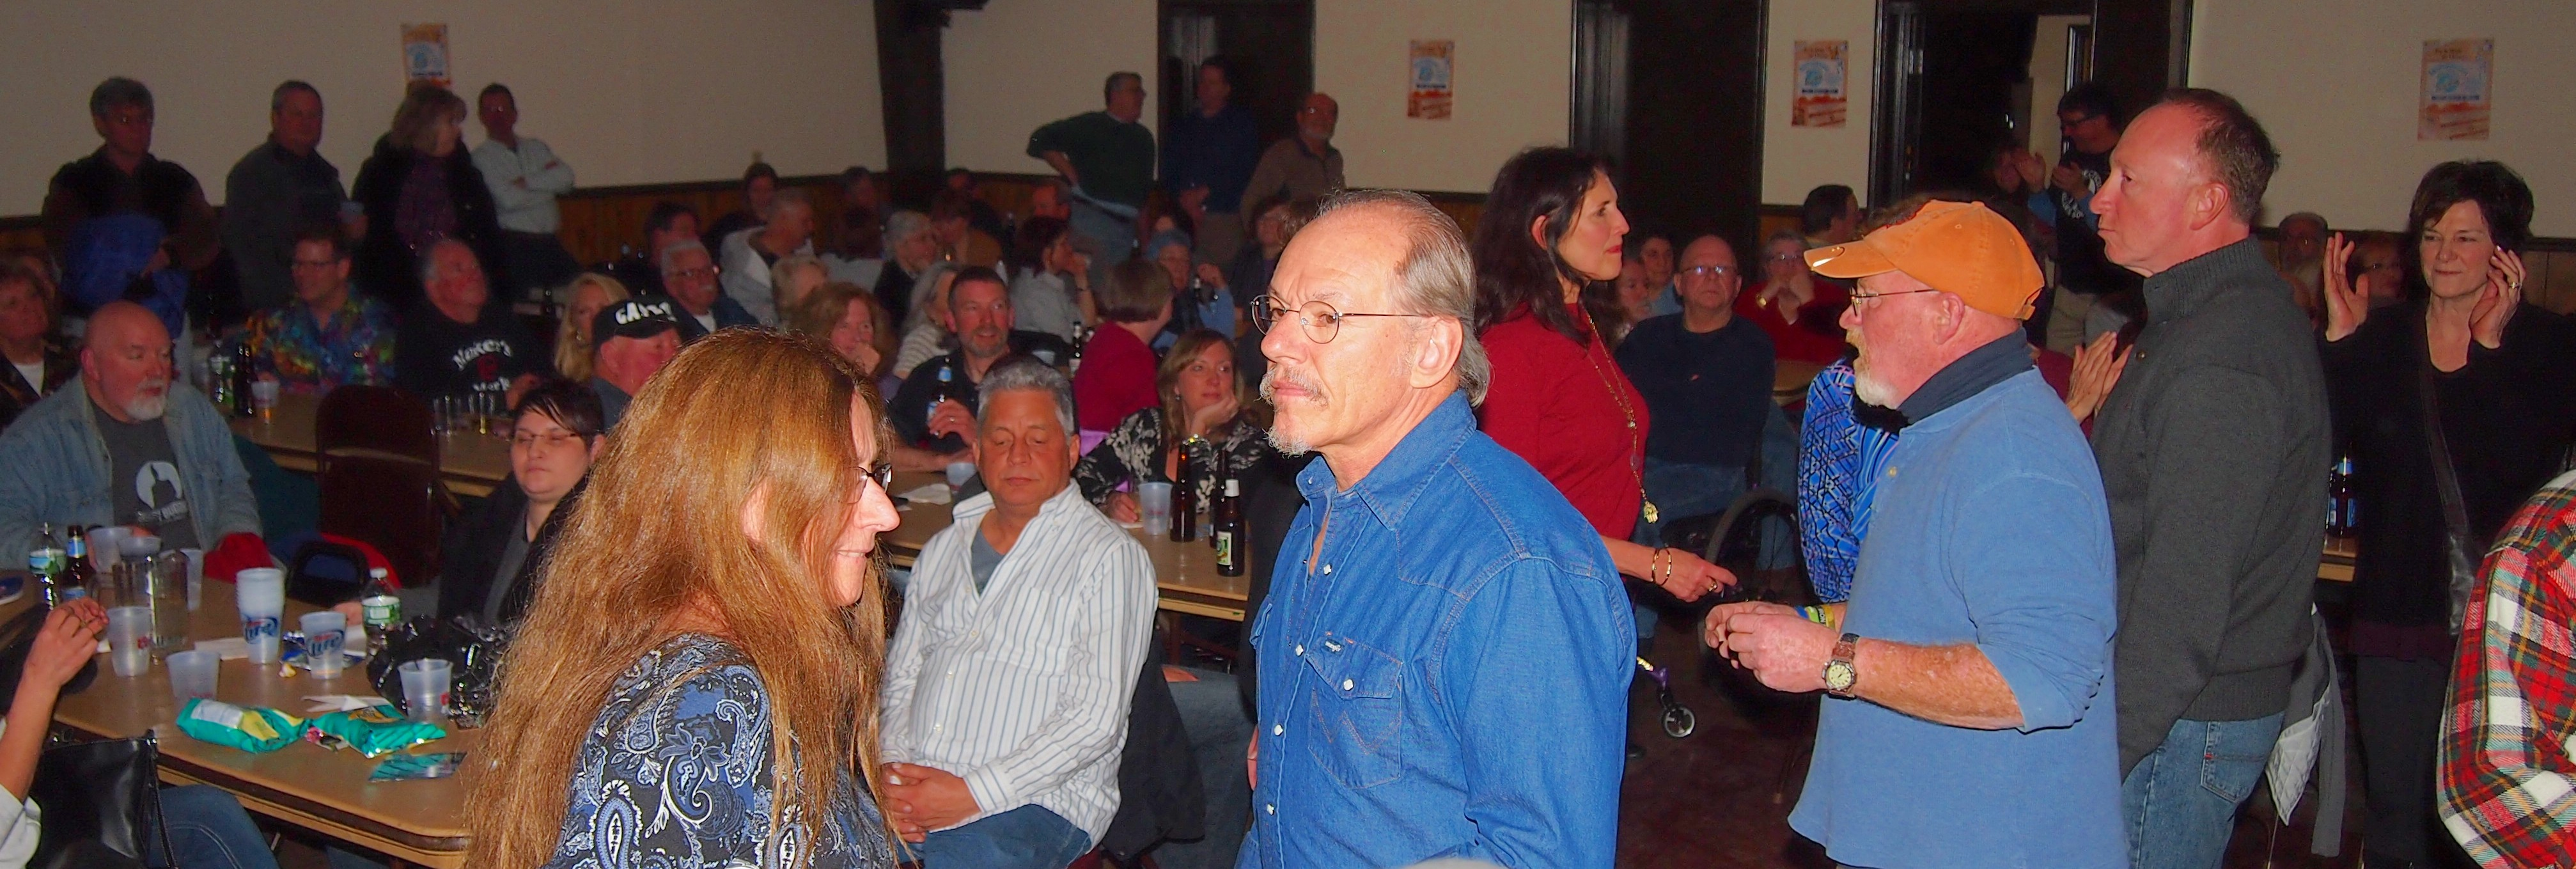 Crowd3-5-20159